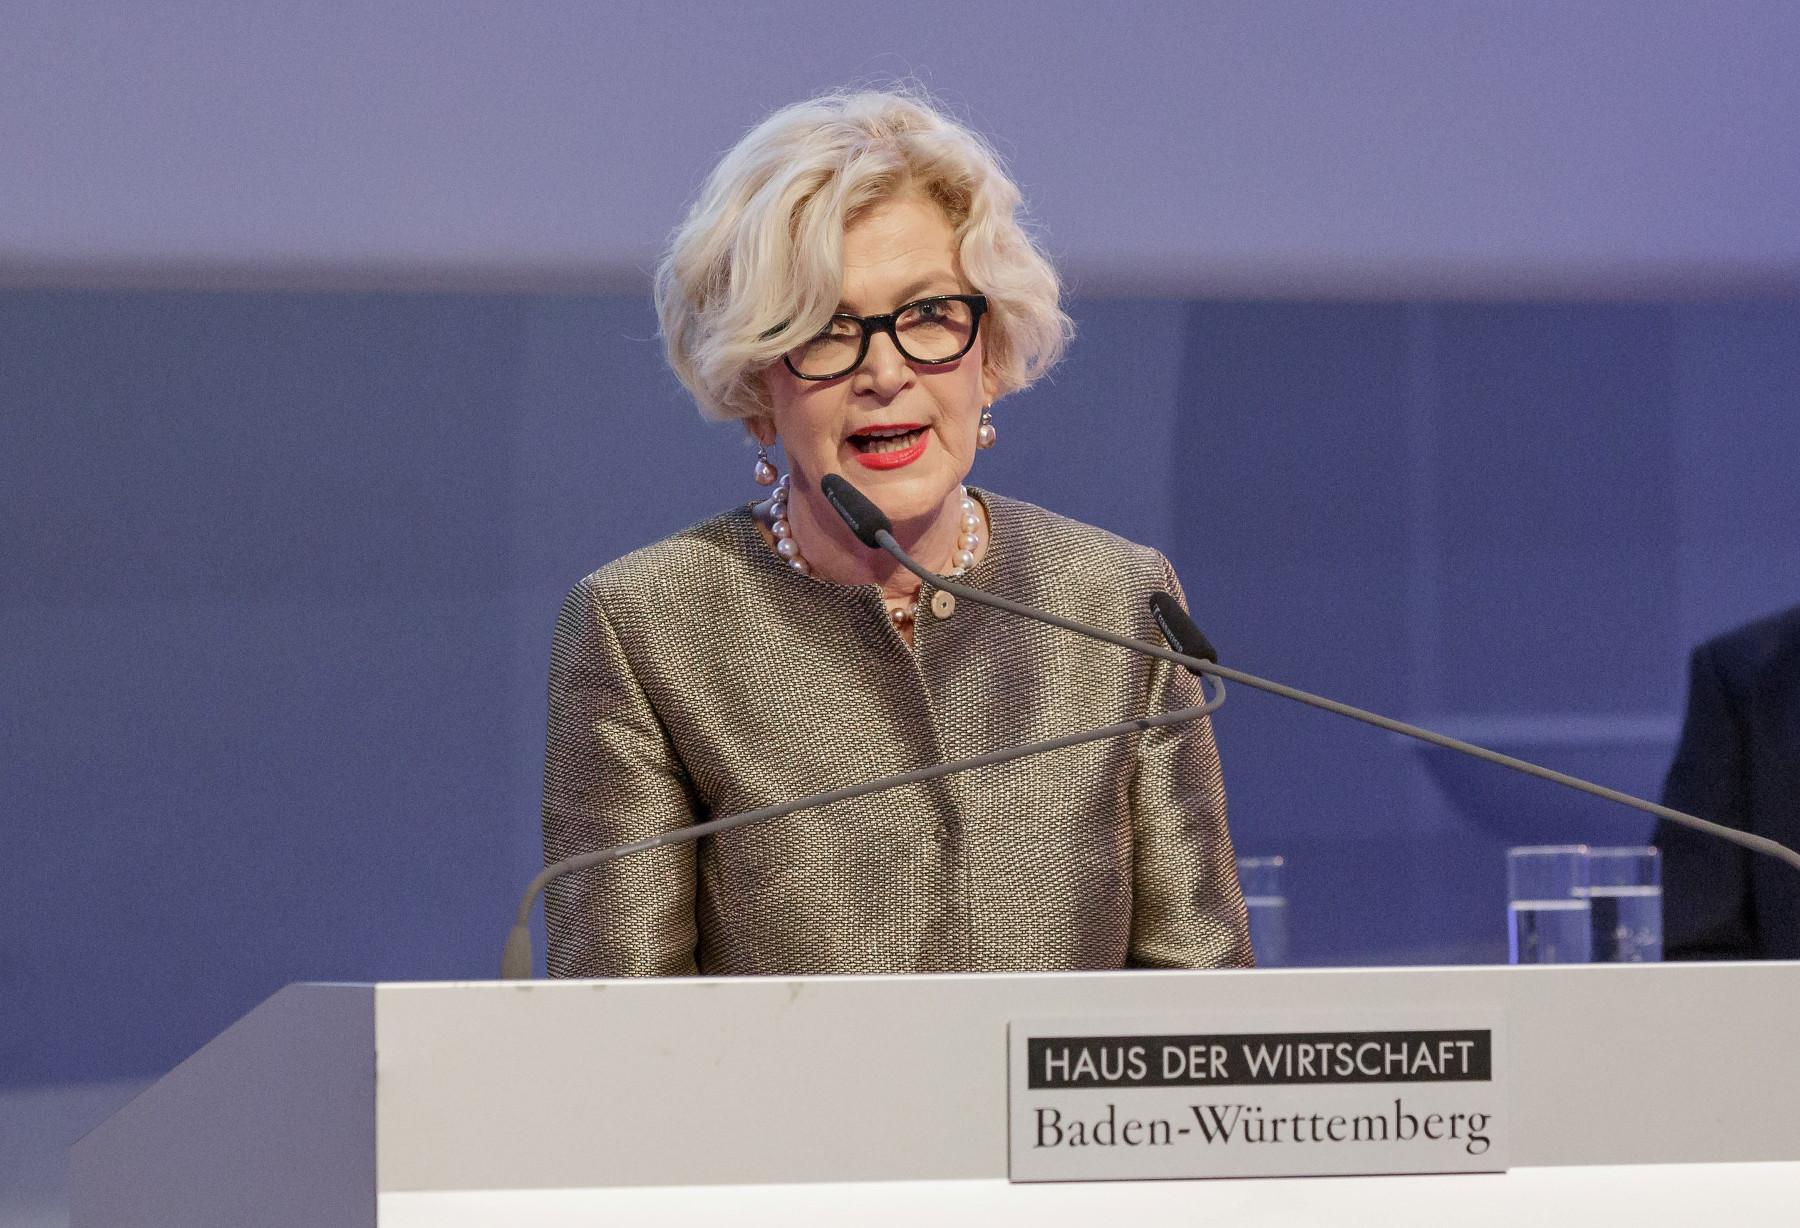 Verleihung_des_Staatspreis_Baukultur_Baden-Wu__rttemberg_2016_Laudatorin_Beispielausschnitt_web.jpg